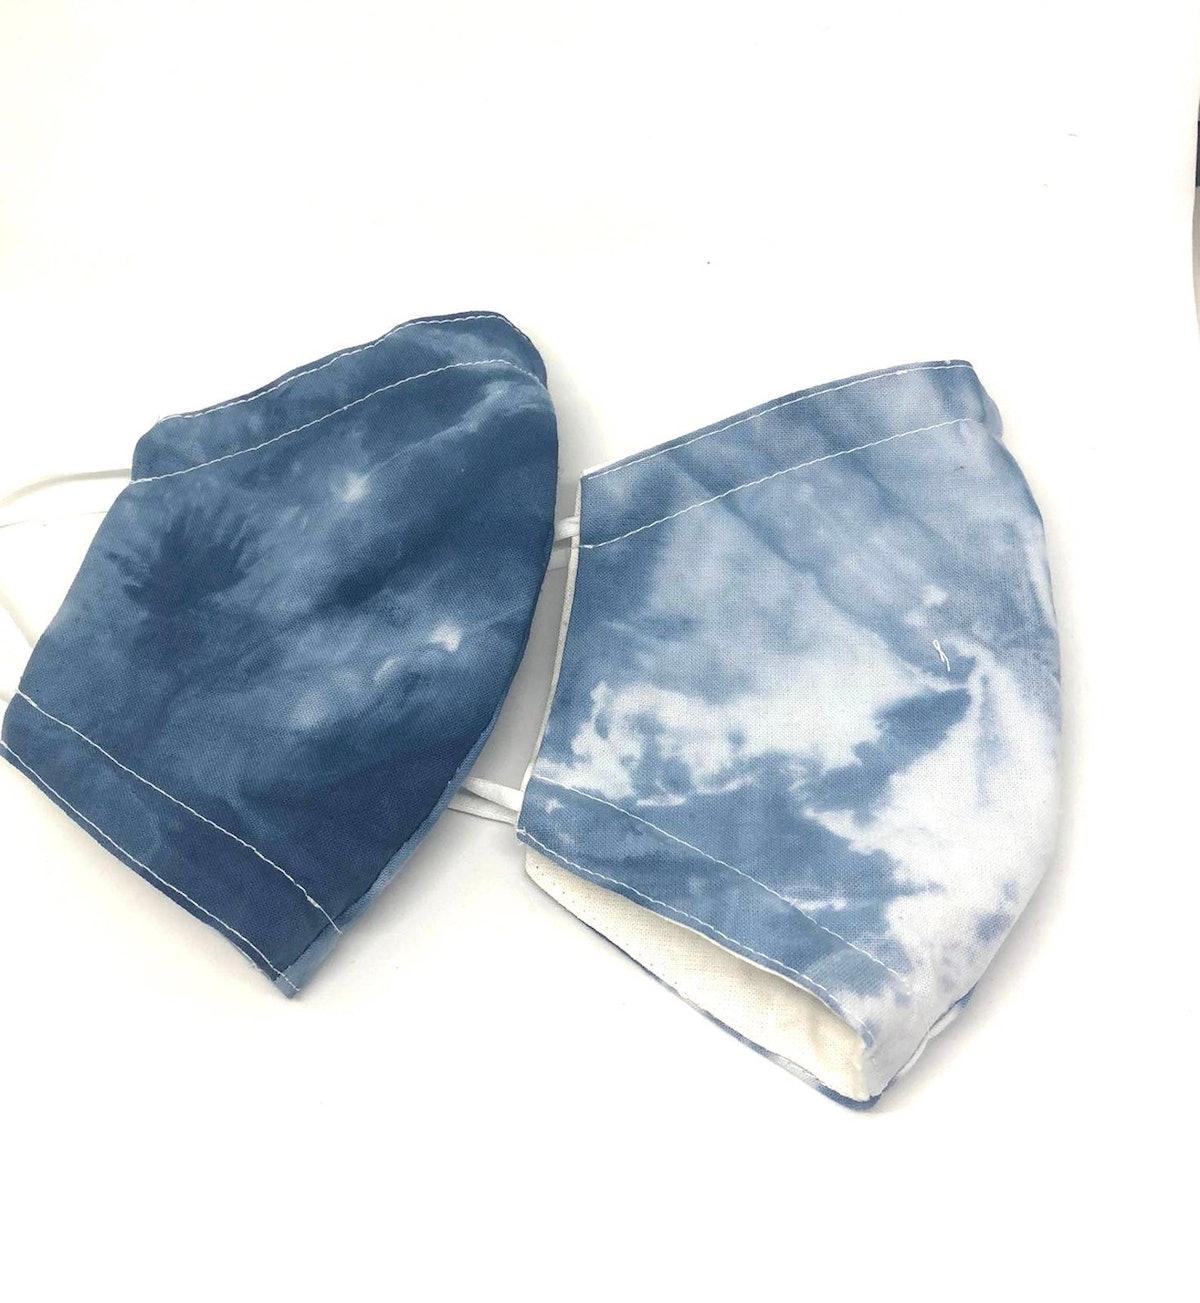 Minkiki Designs 2 Tie Dye Print Masks